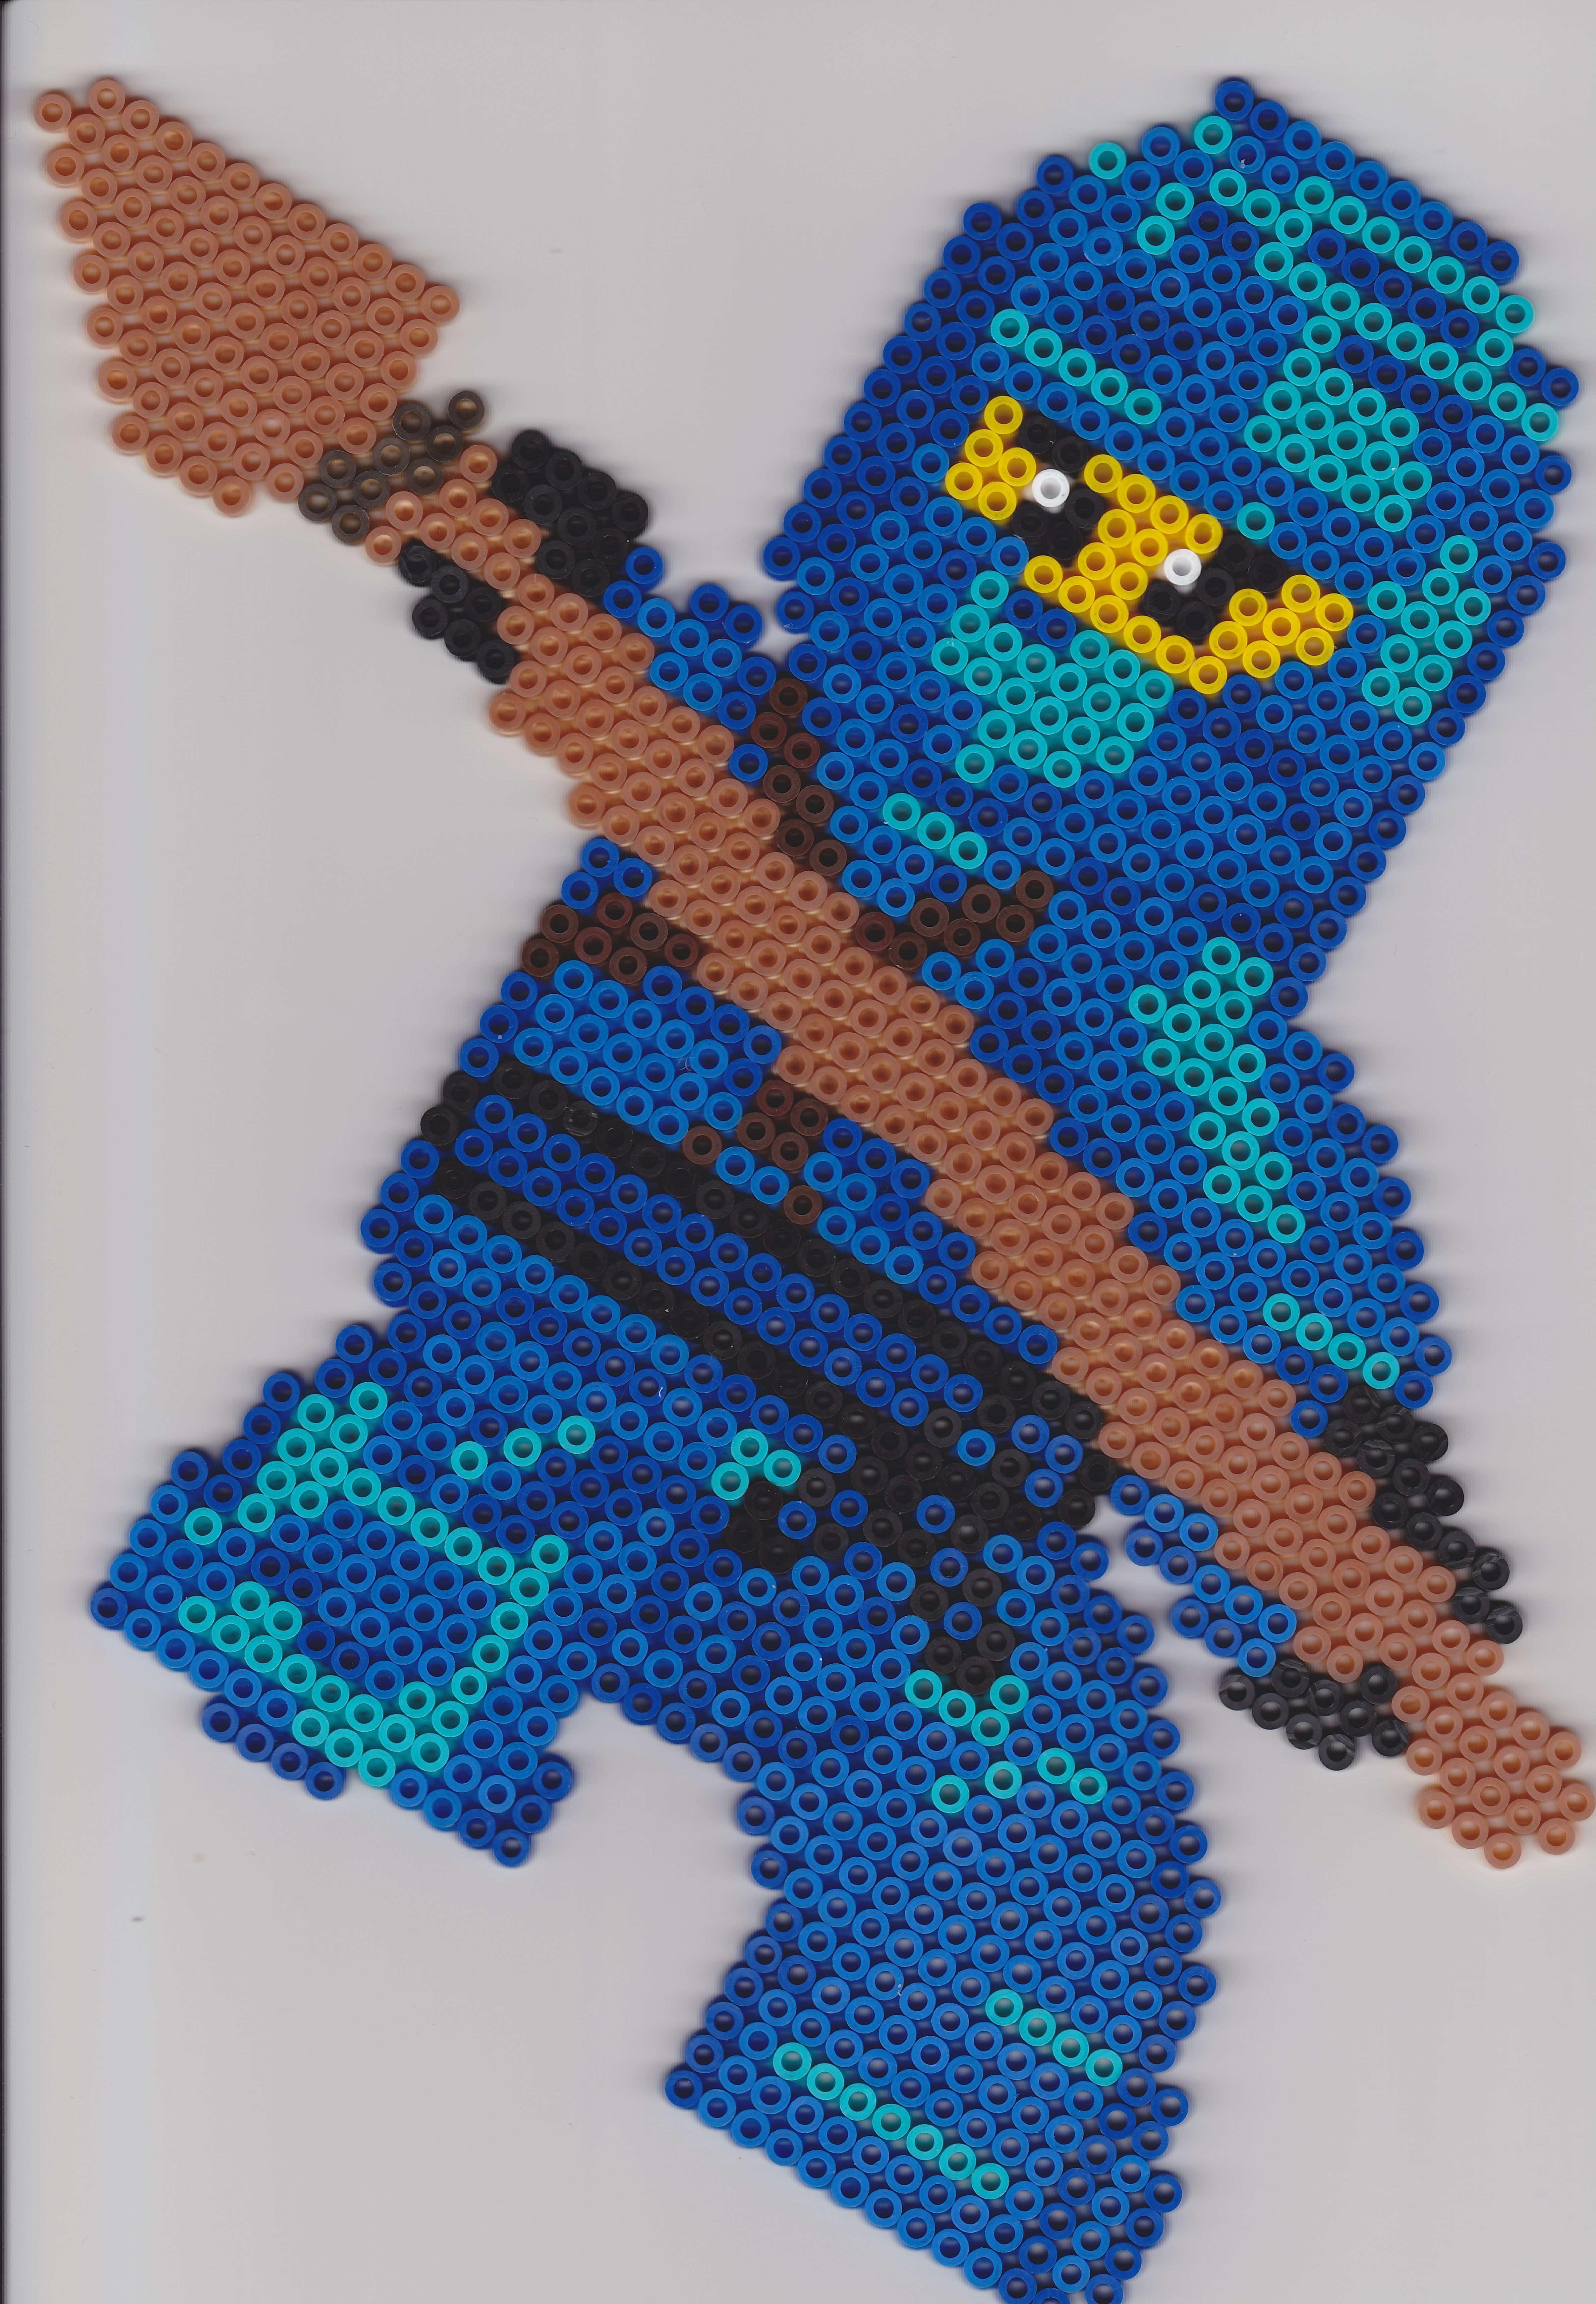 Bugelperlen Ninjago Jay Vorlage Perler Beads Bugelperlen Hama Perlen Muster Hama Bugelperlen